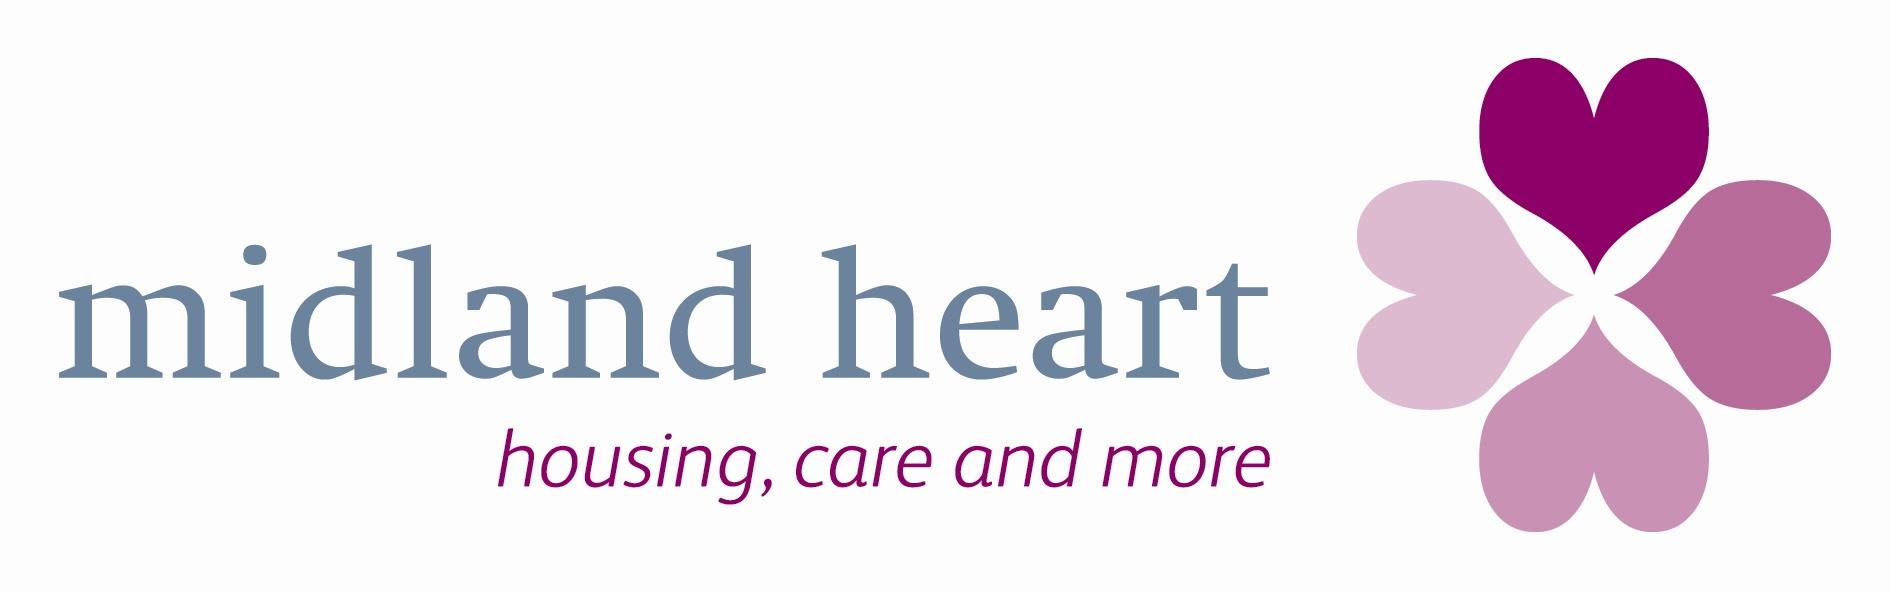 midland-heart